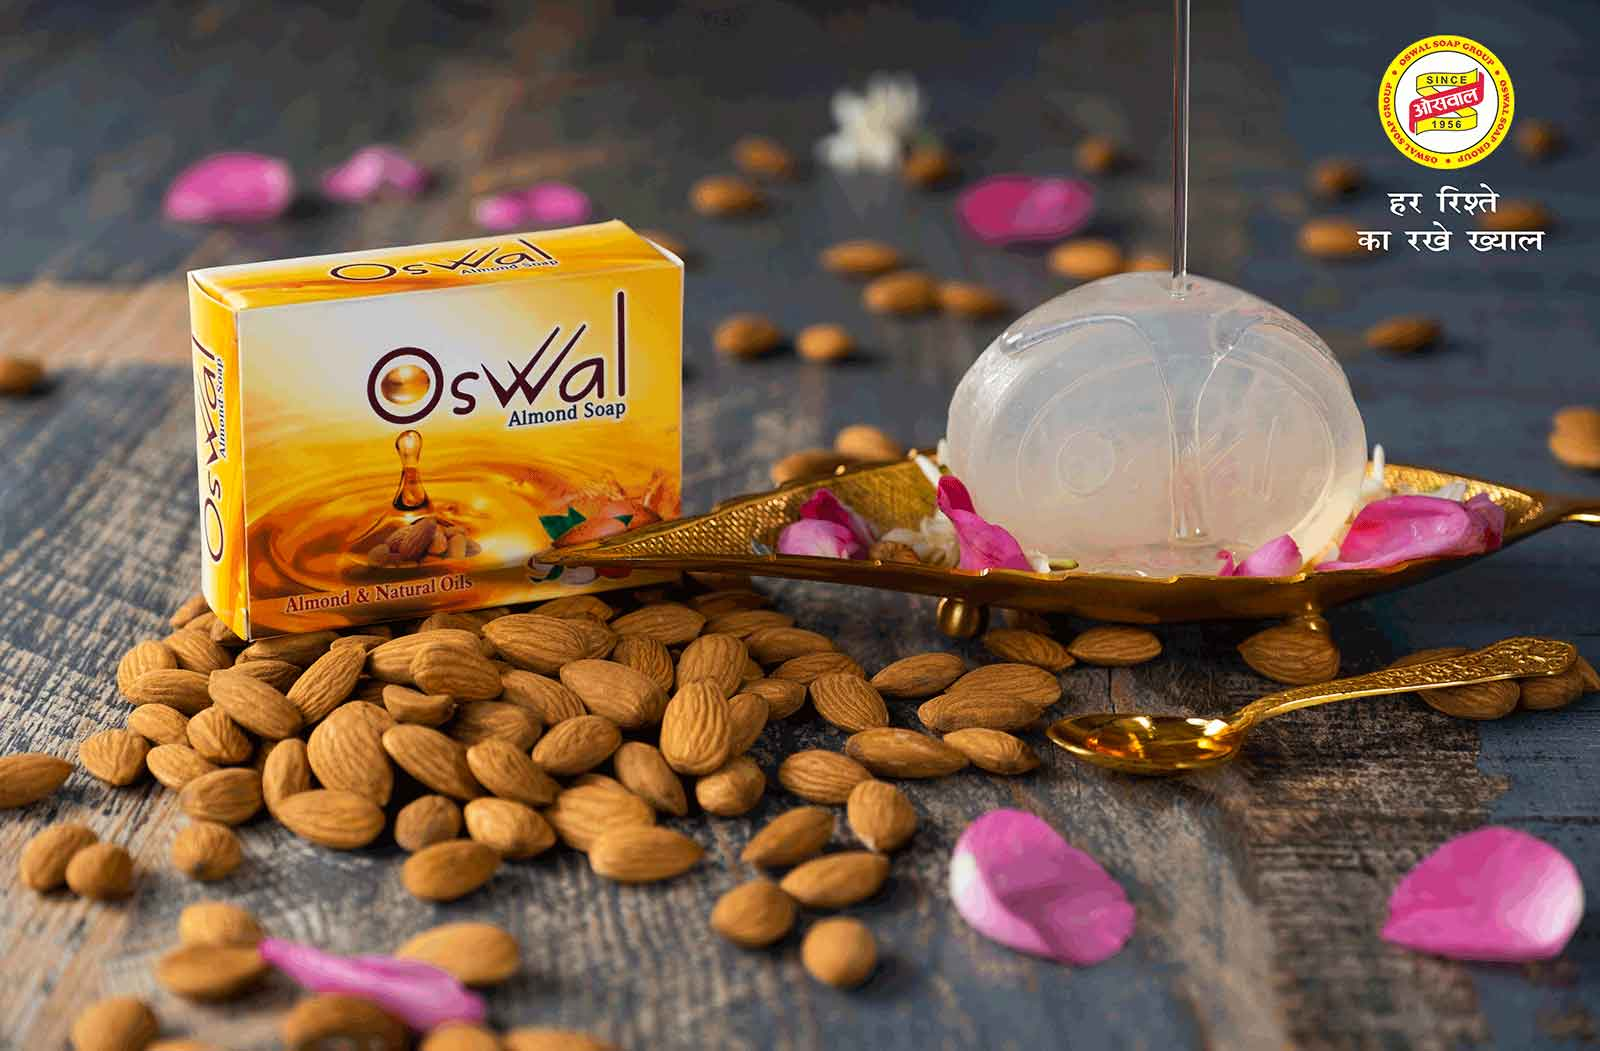 Oswal Bath Soap